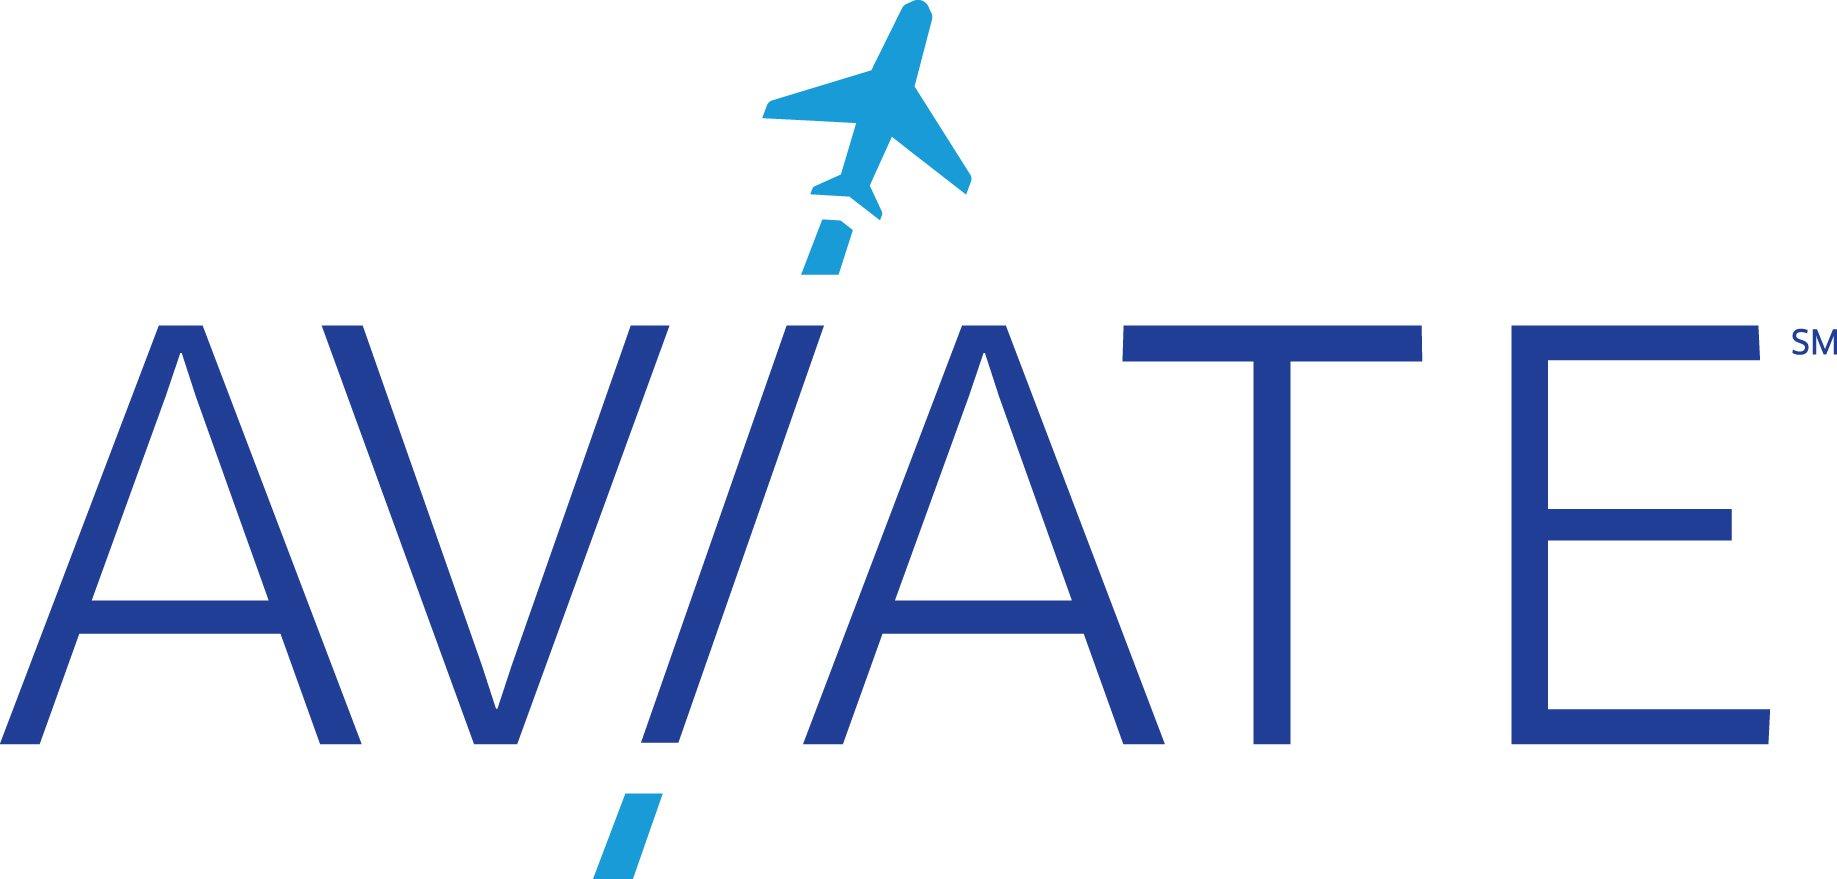 United Aviate Logo